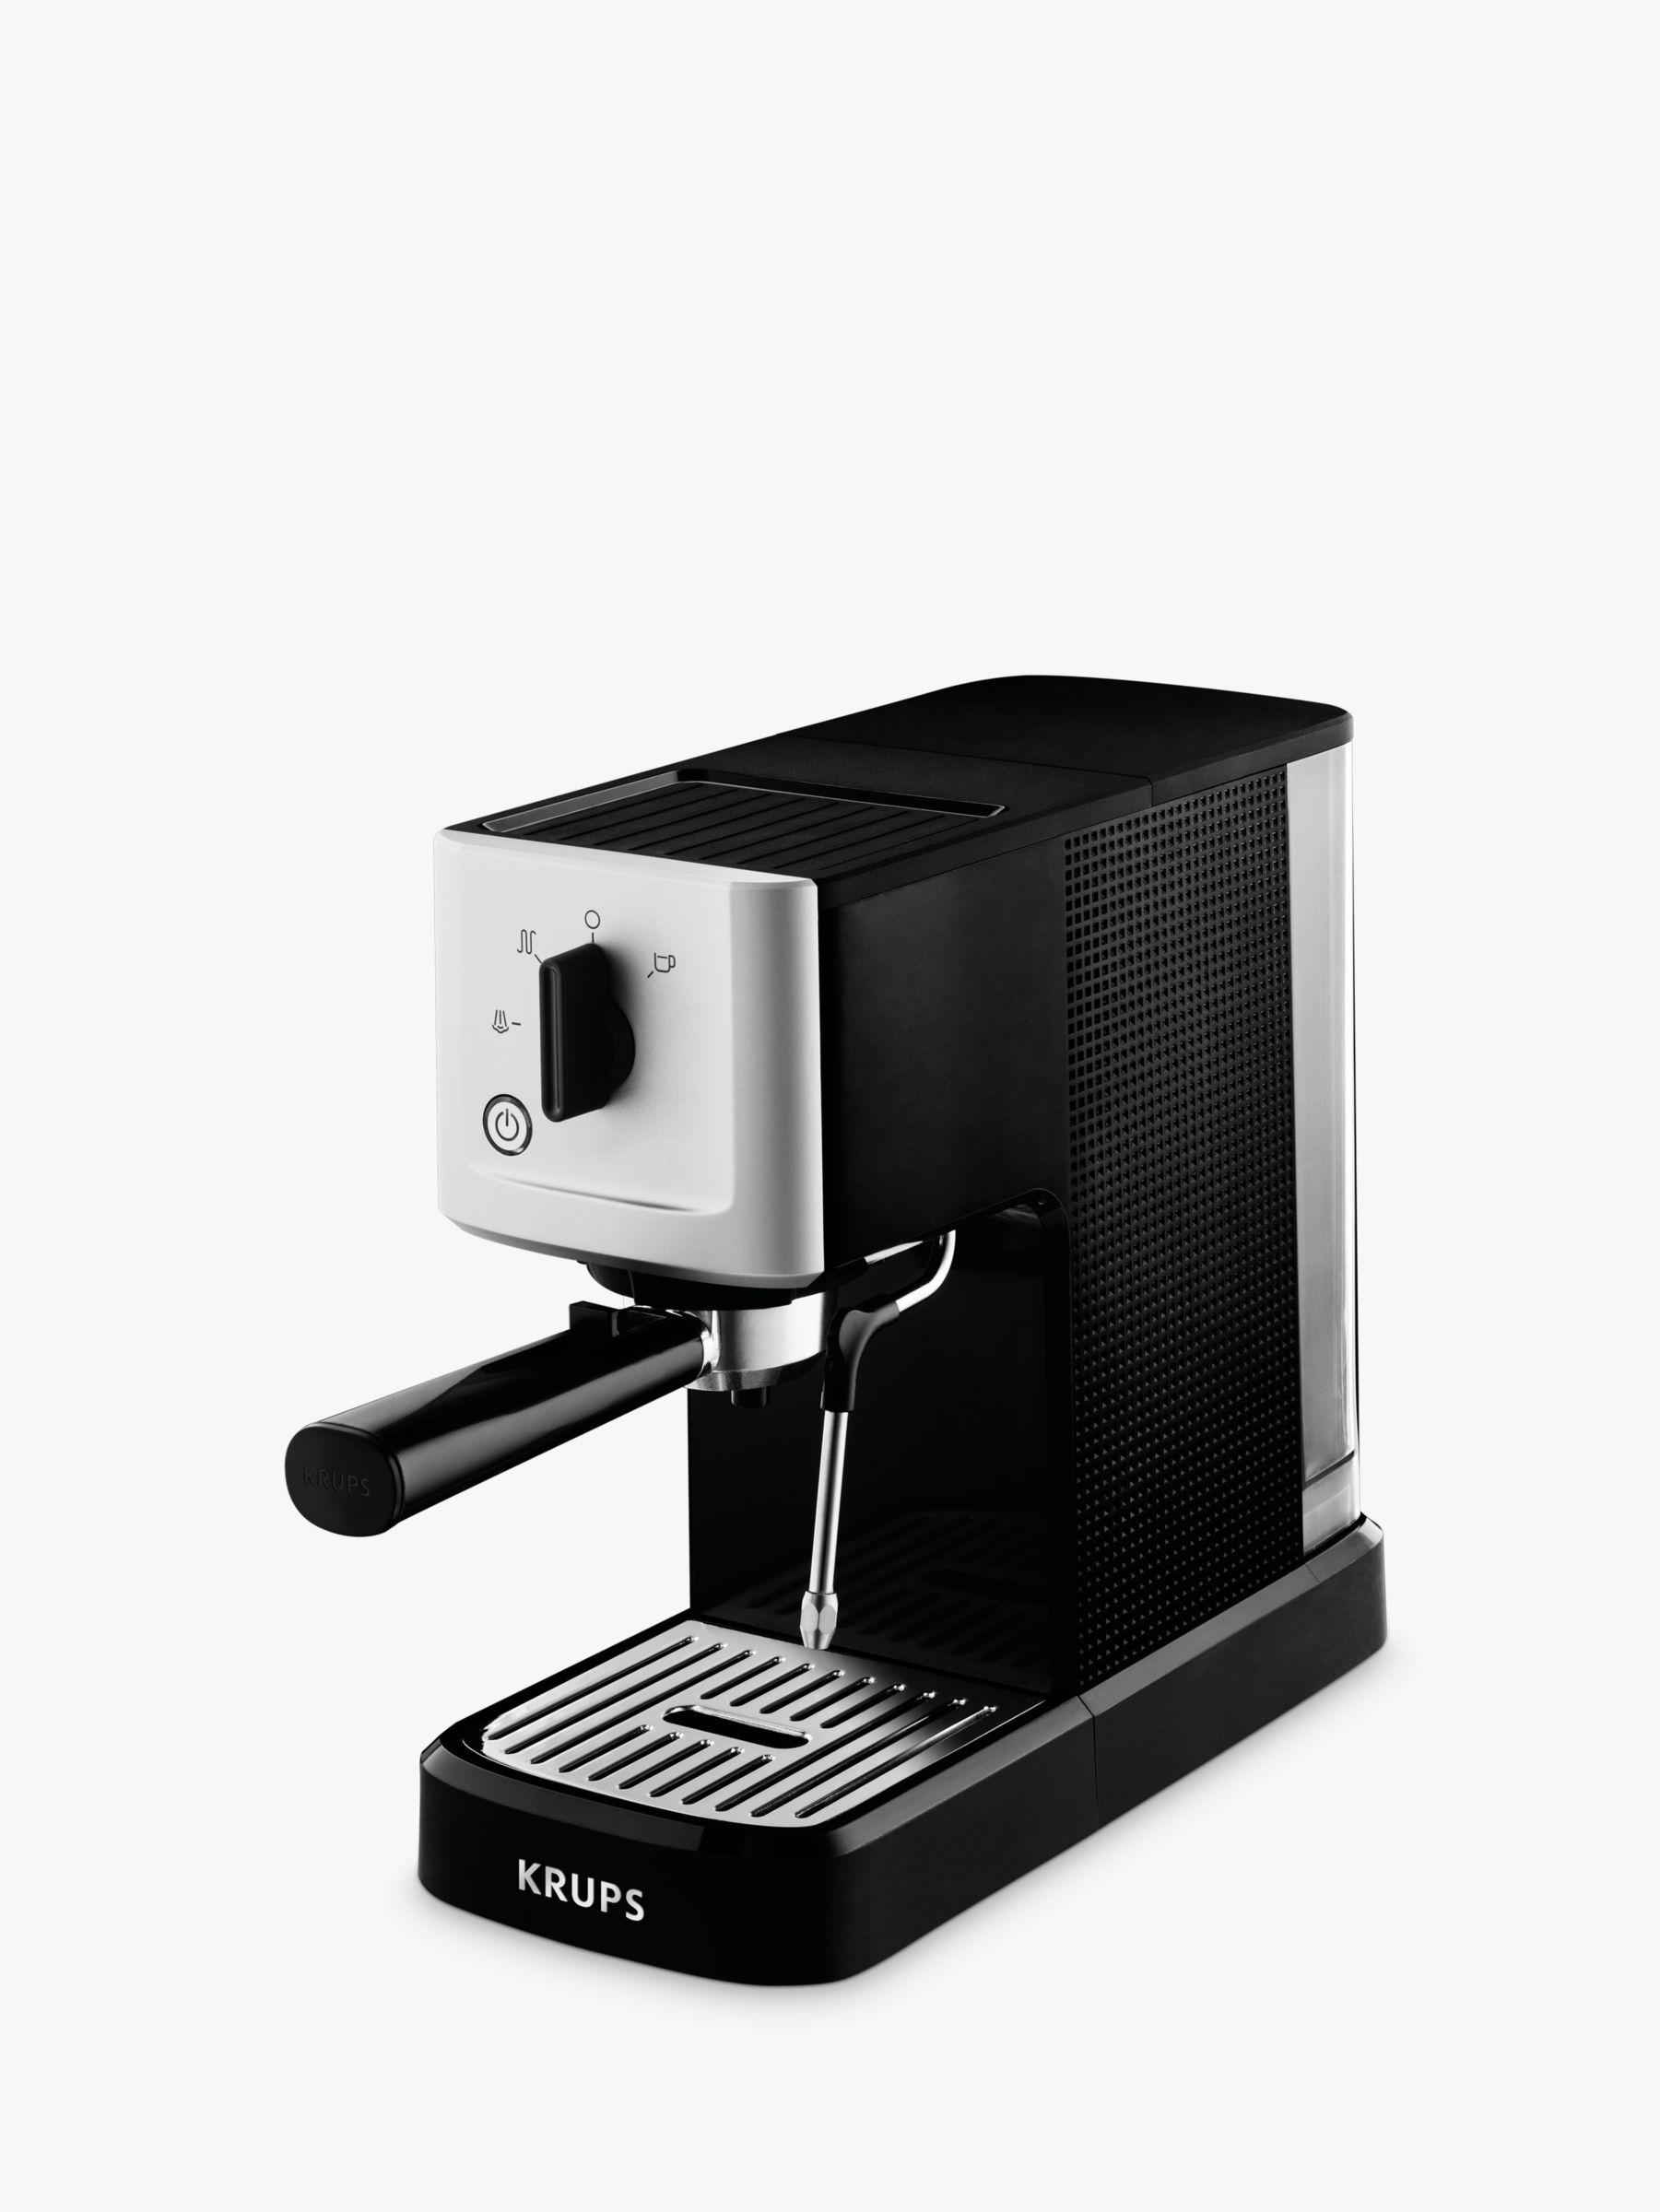 Krups Krups XP344040 Calvi Manual Espresso Machine, Black